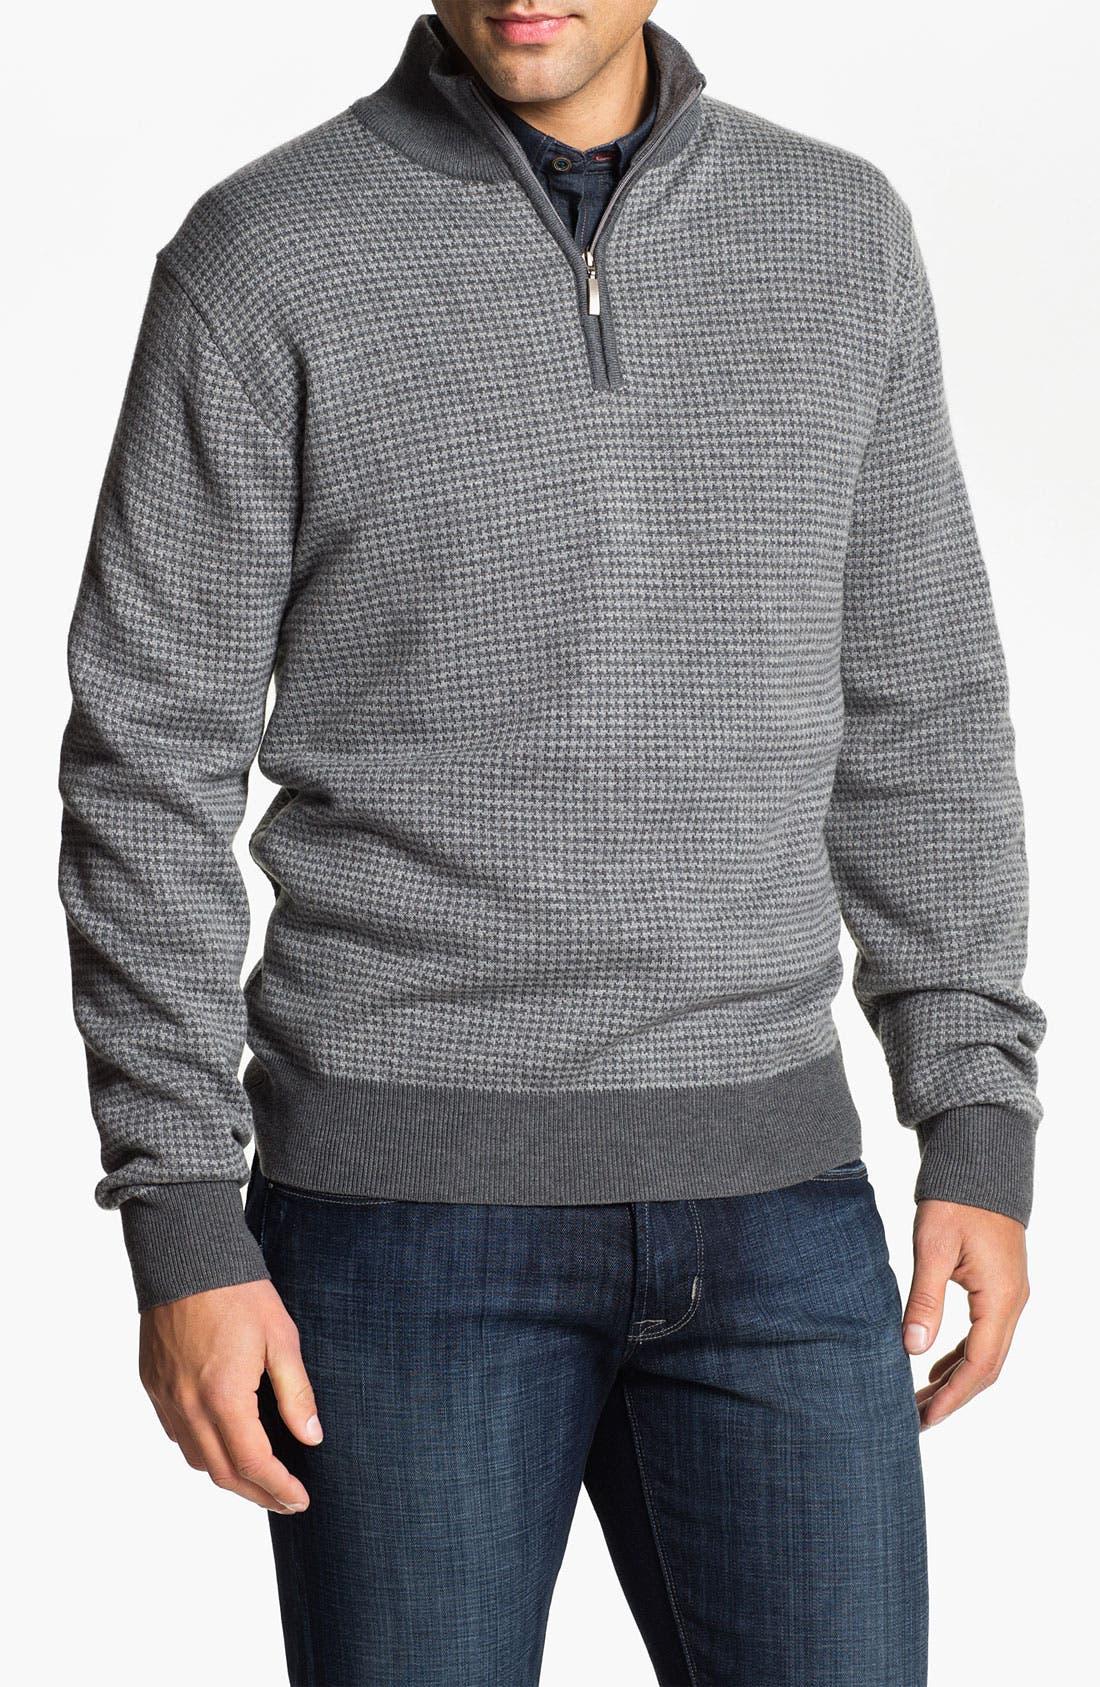 Alternate Image 1 Selected - Toscano Merino Quarter Zip Wool Blend Sweater